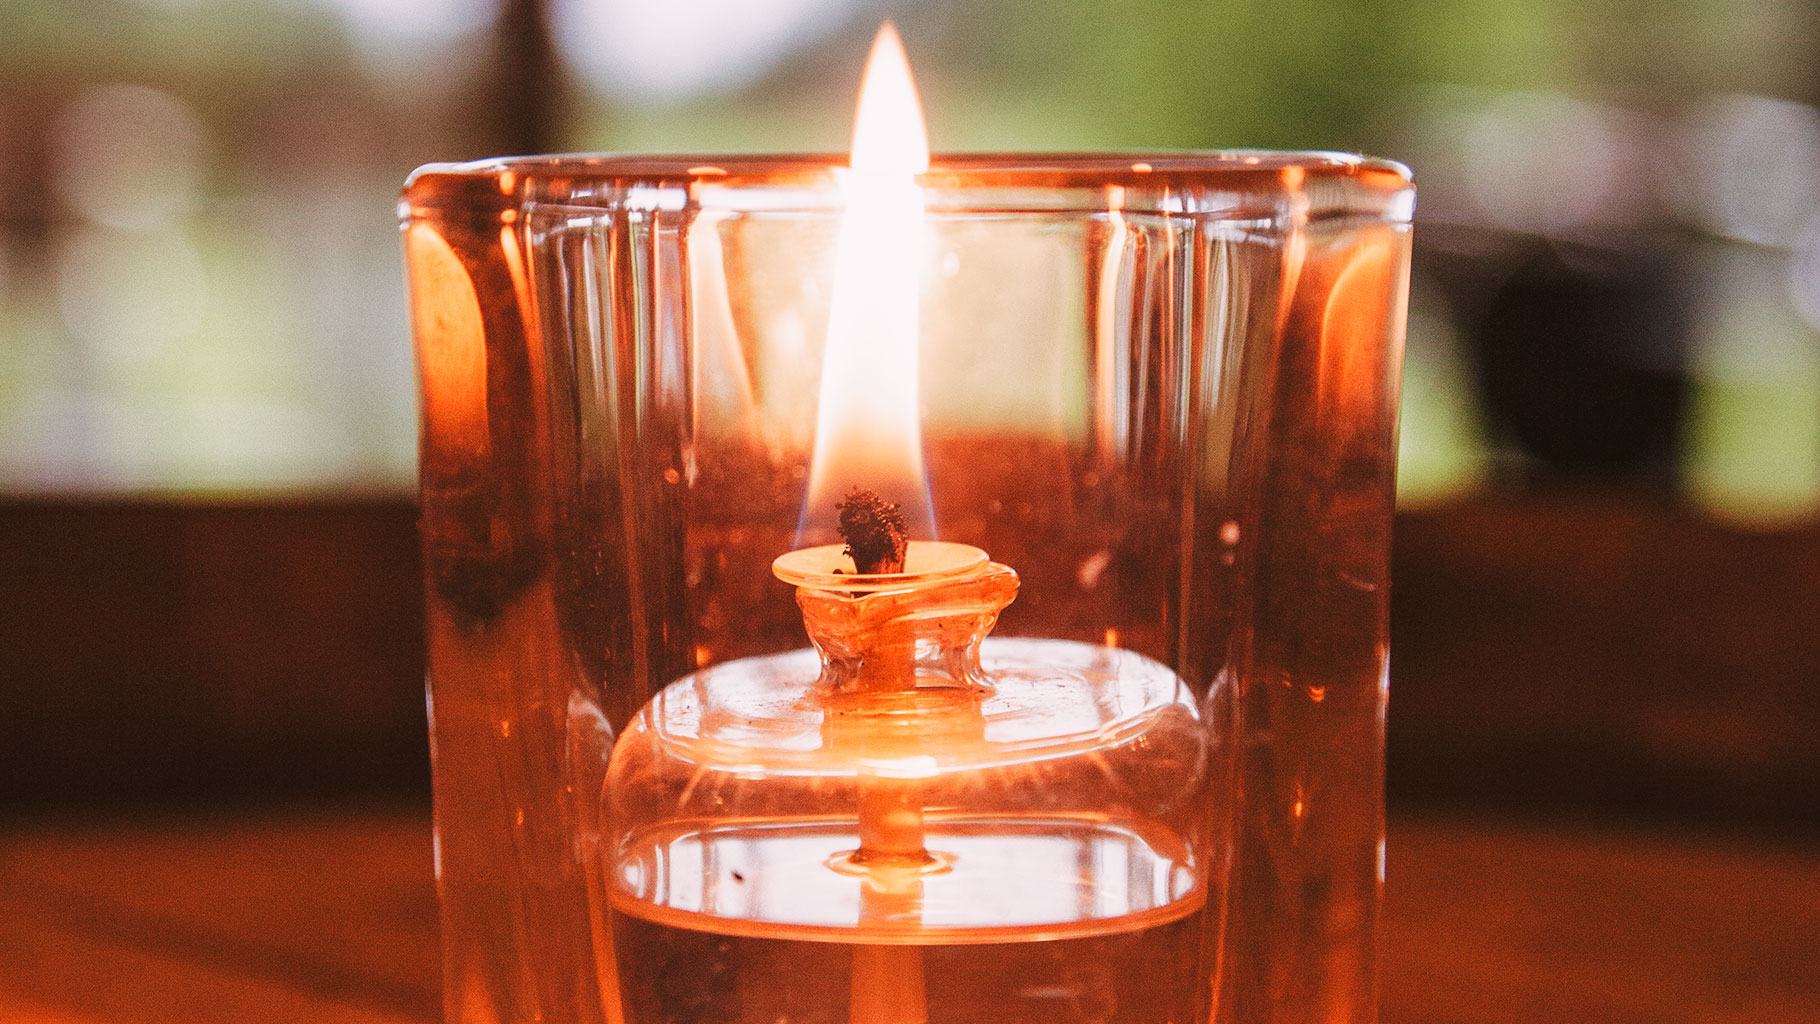 kelowna-candle